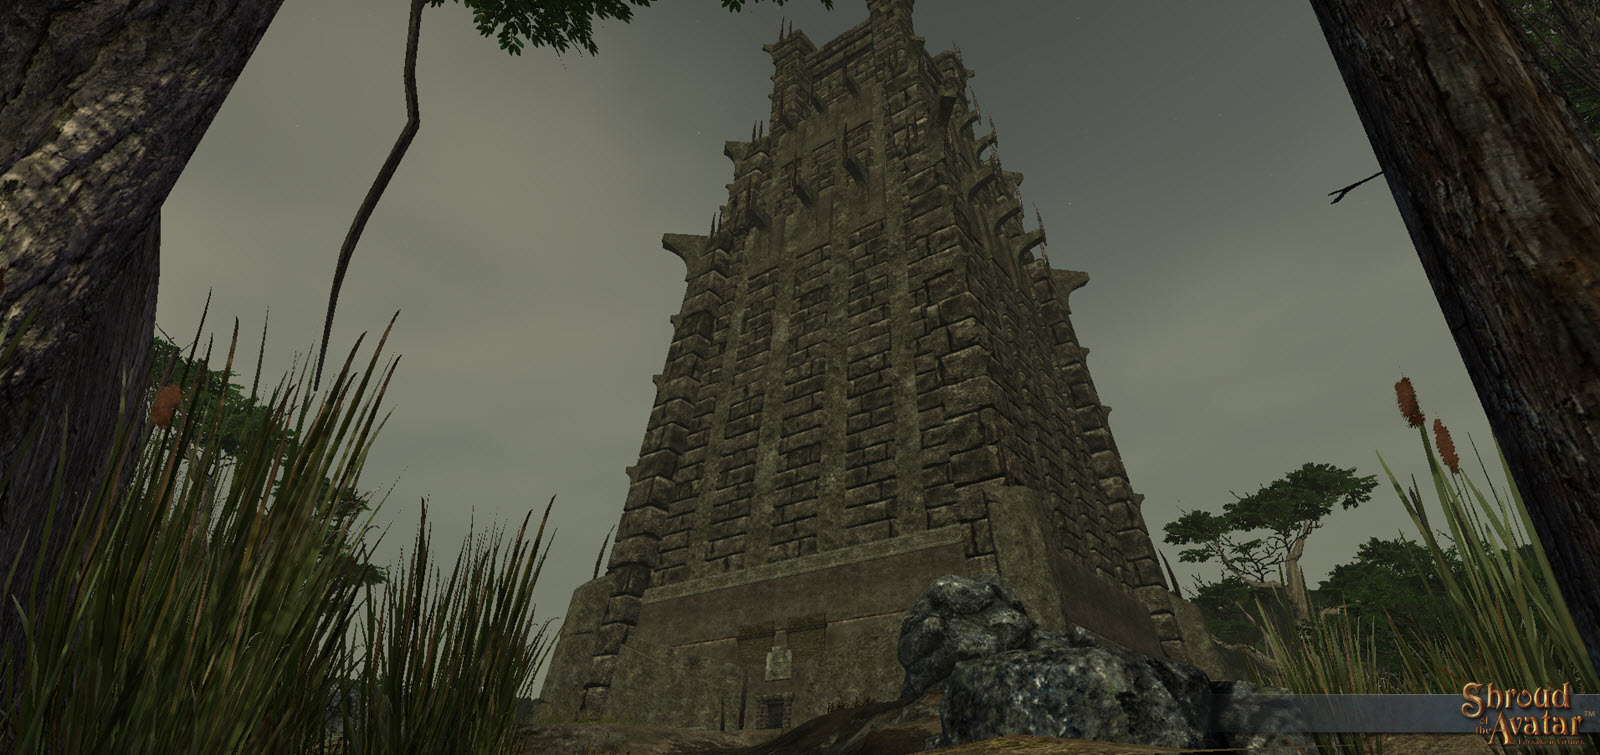 SotA_TowerShutteredEye_external3